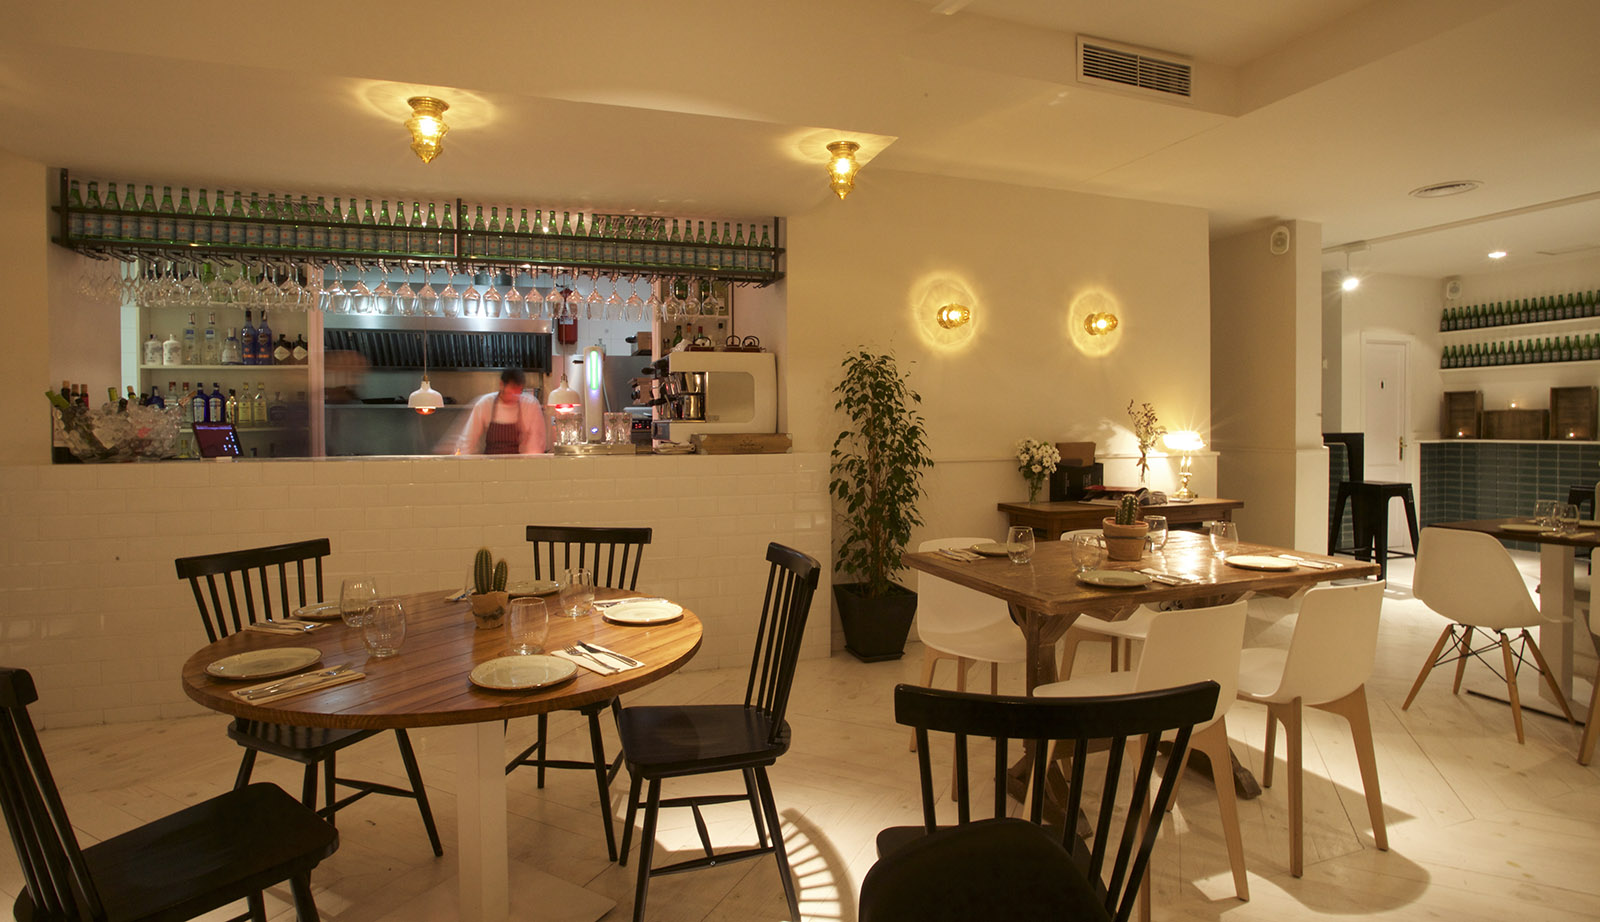 restaurante alcalá de henares